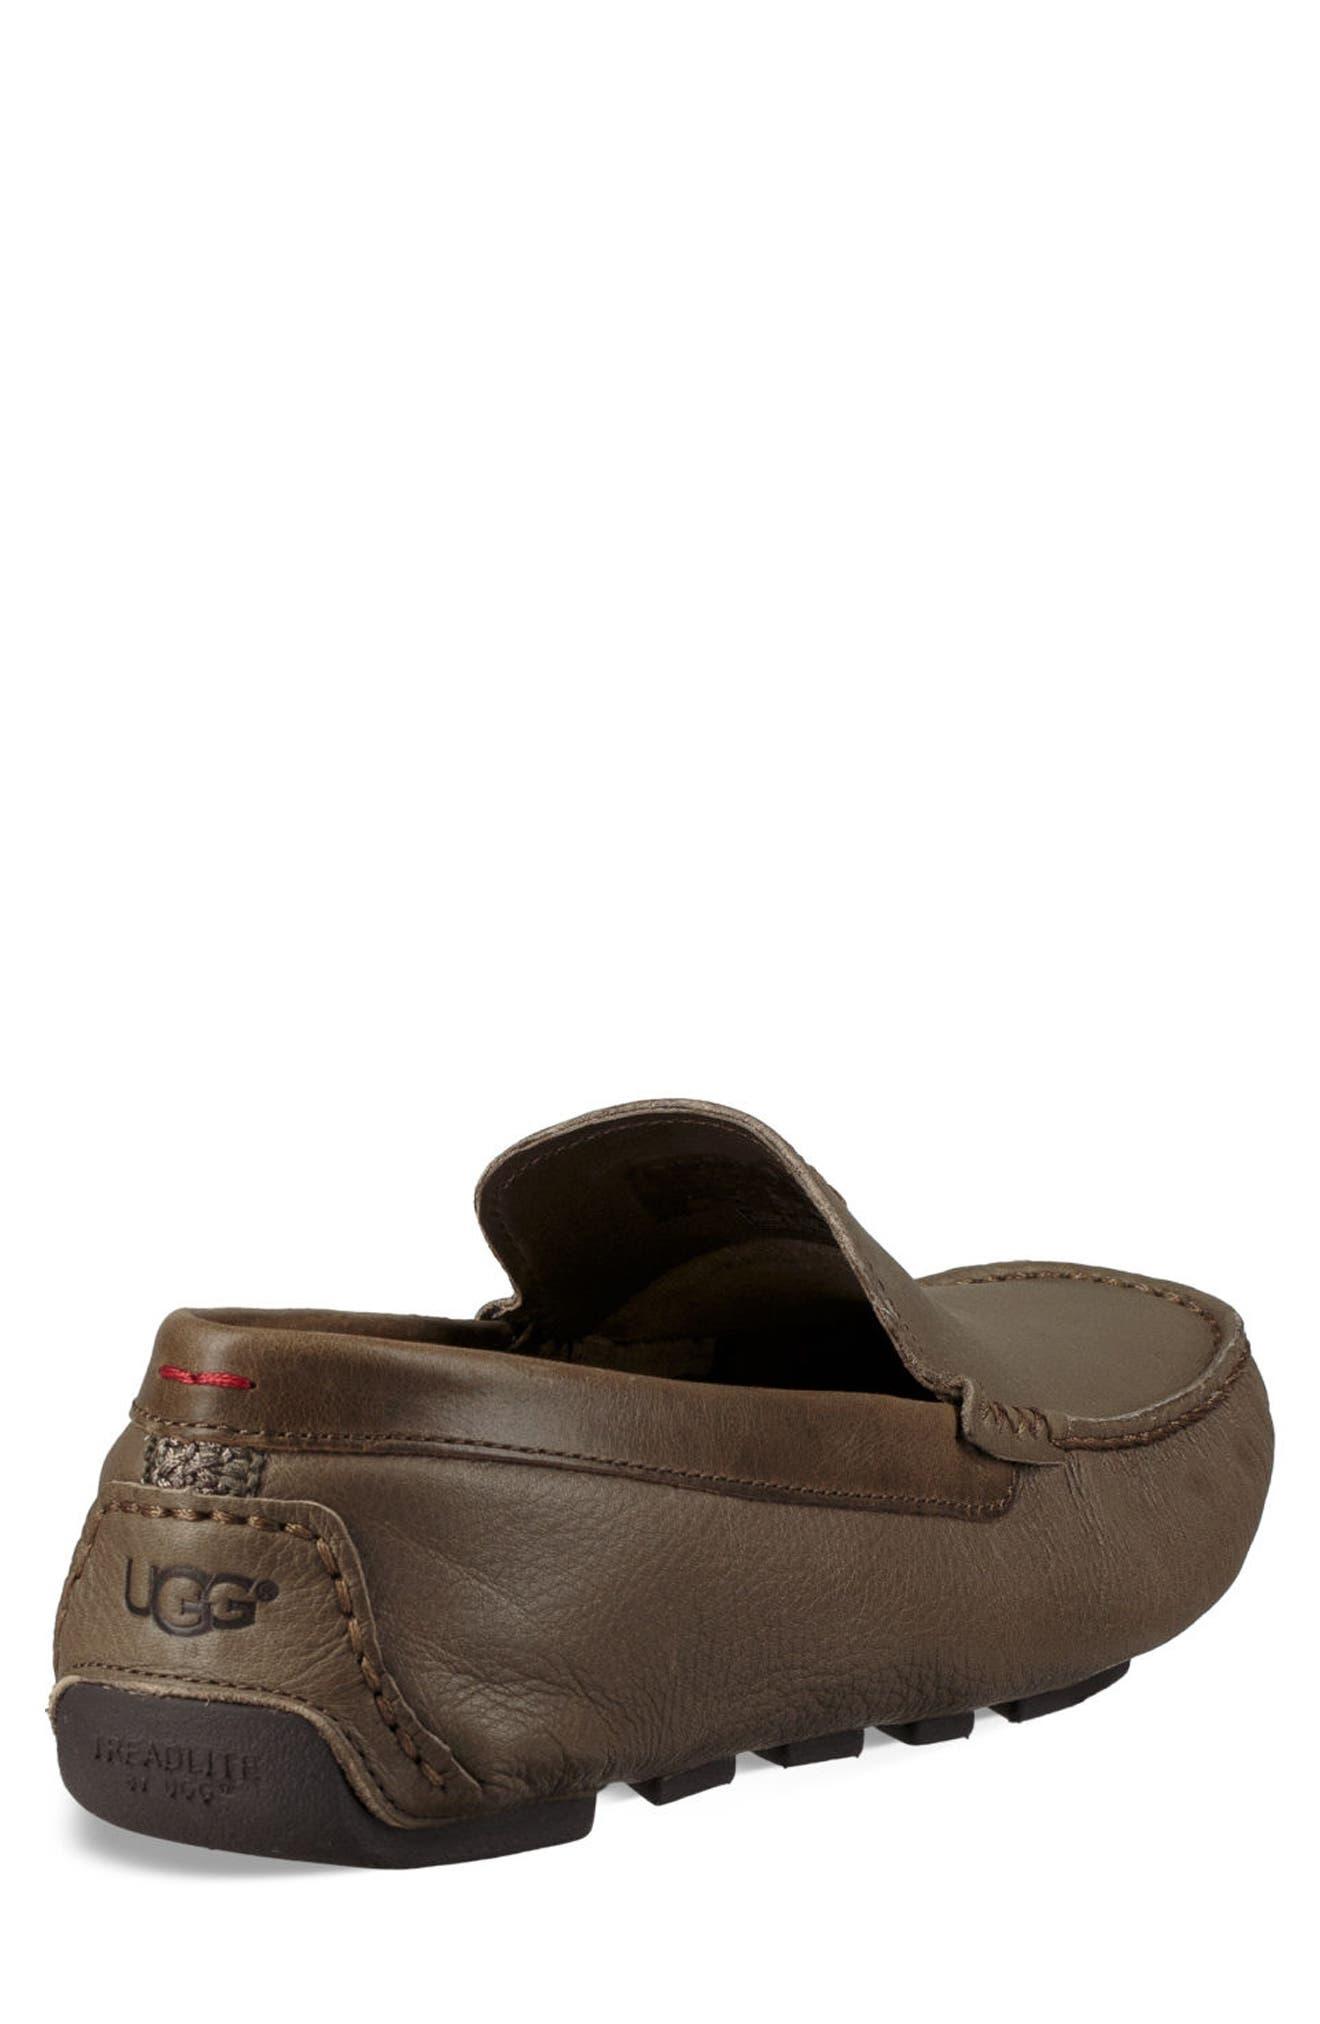 UGG<SUP>®</SUP>, 'Henrick' Driving Shoe, Alternate thumbnail 2, color, TAUPE